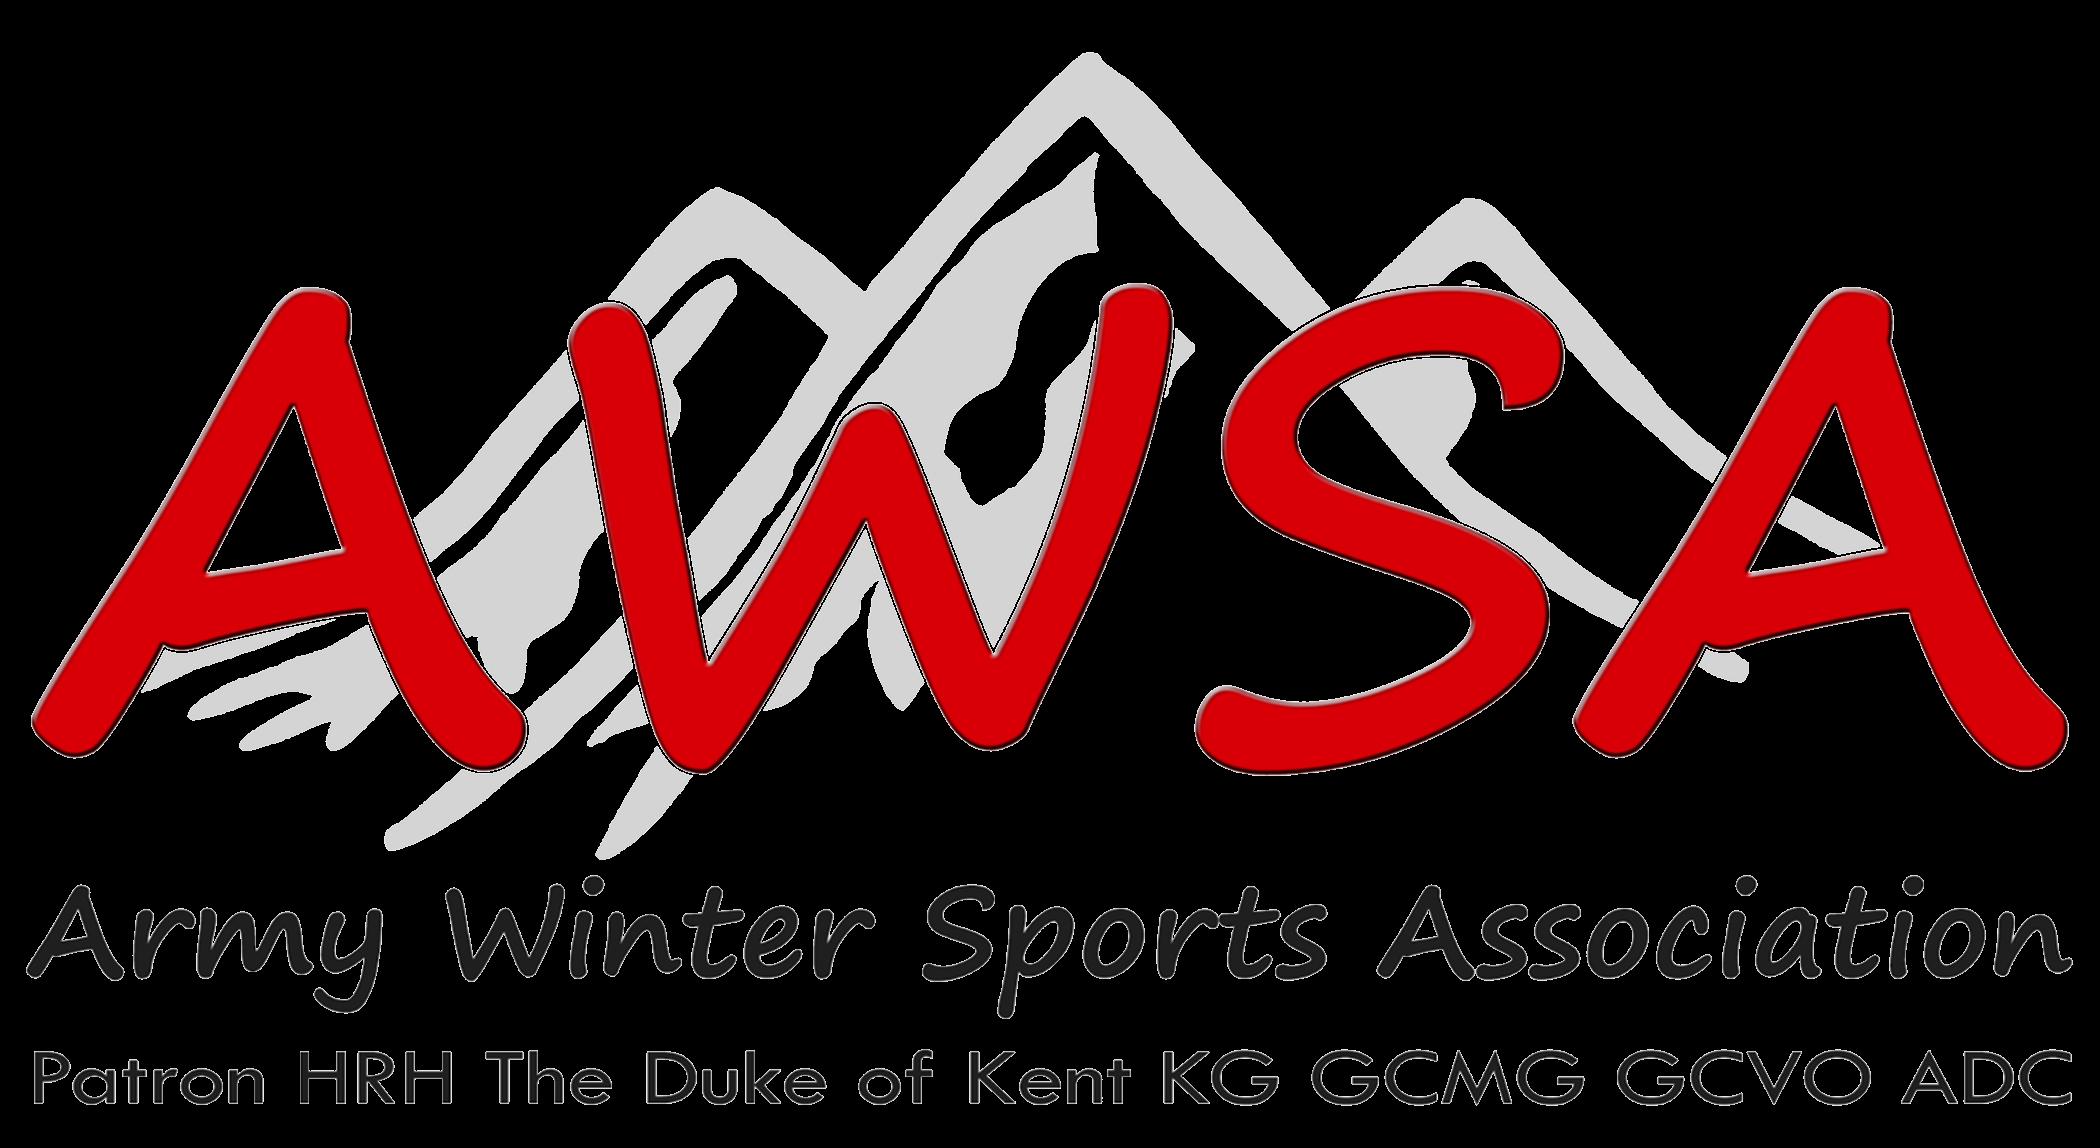 Army Winter Sports Association